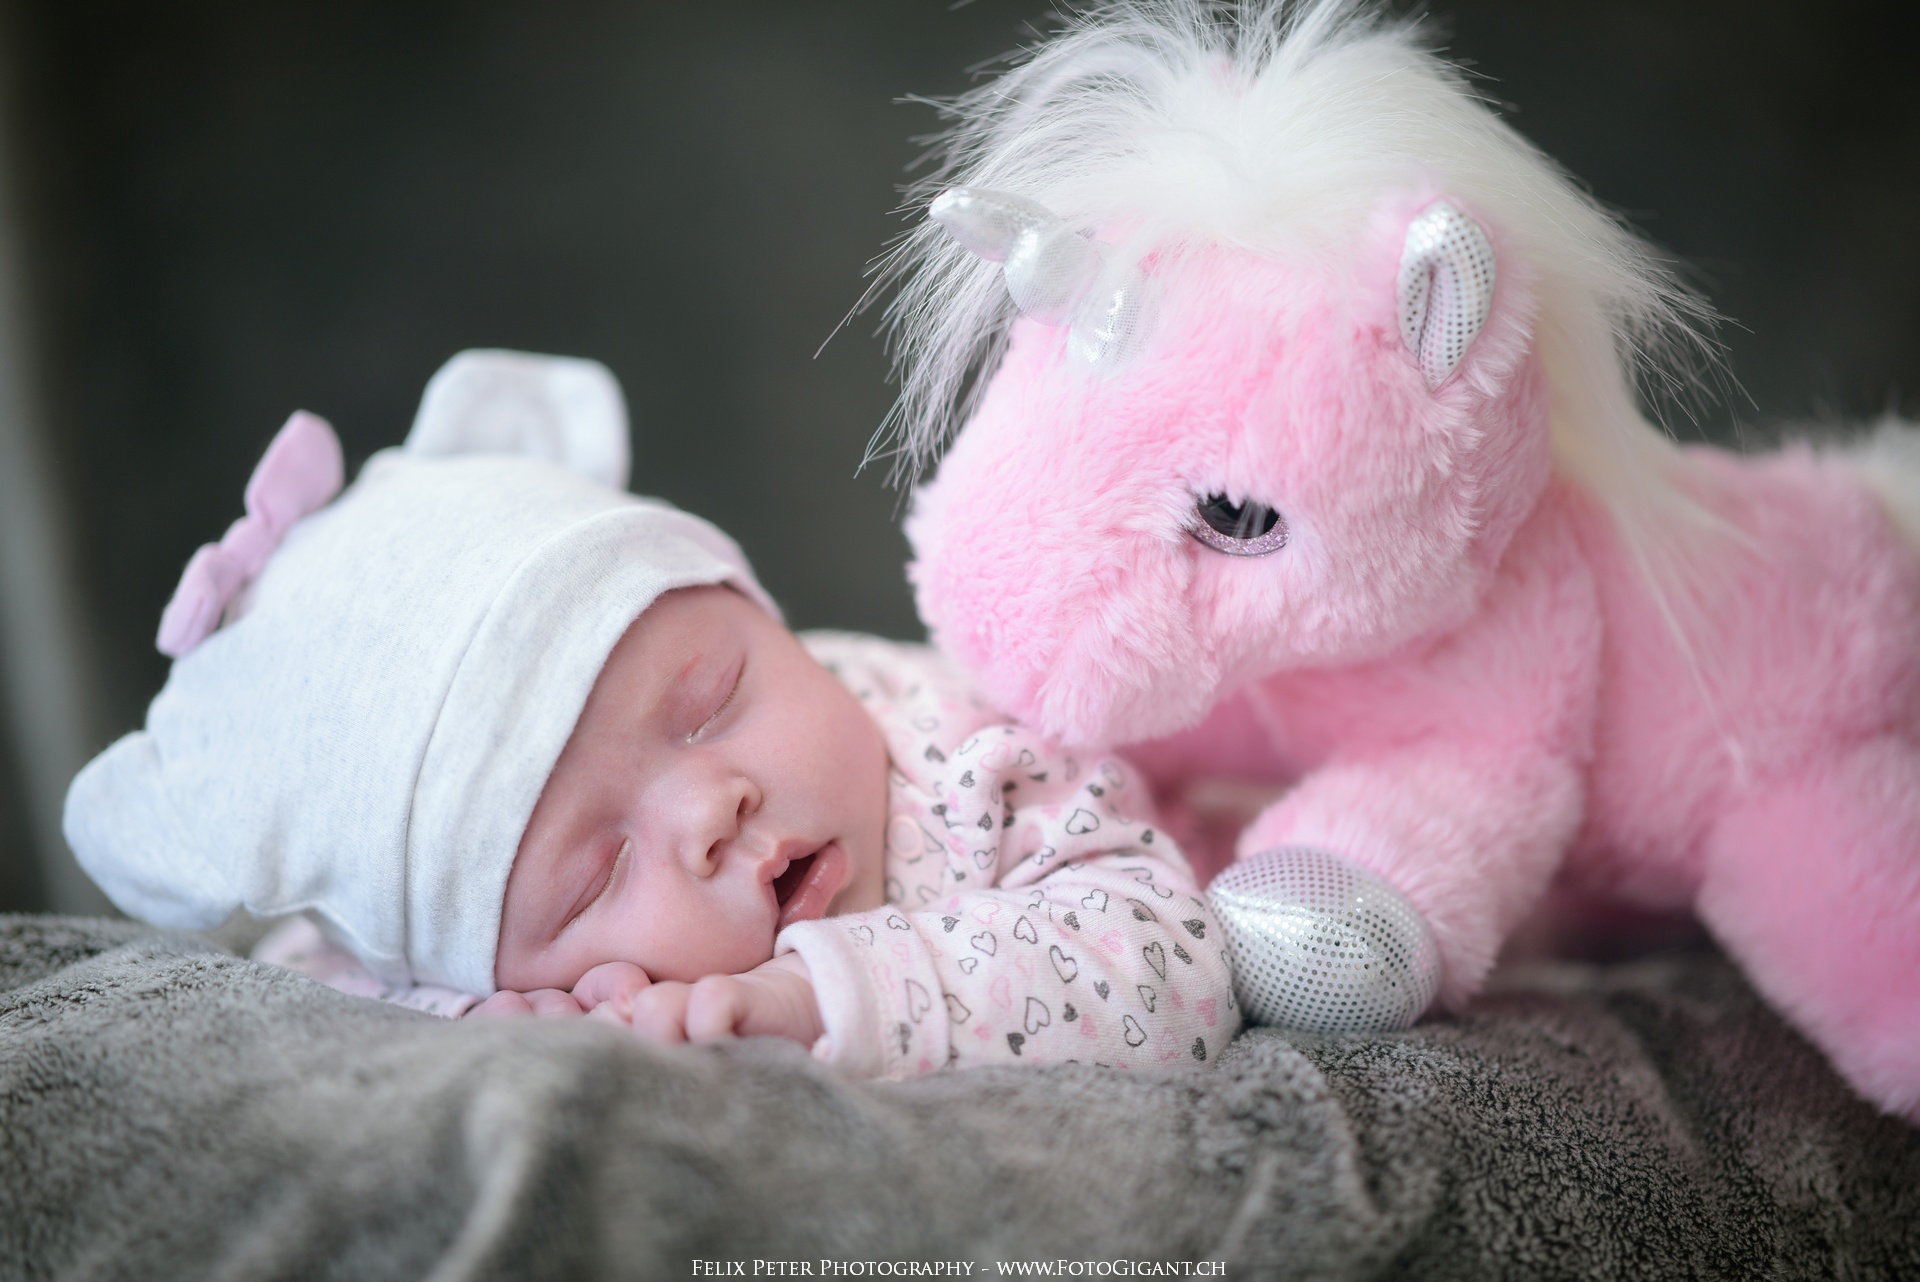 Felix-Peter_Baby-Newborn-Fotografie_Bern01.jpg